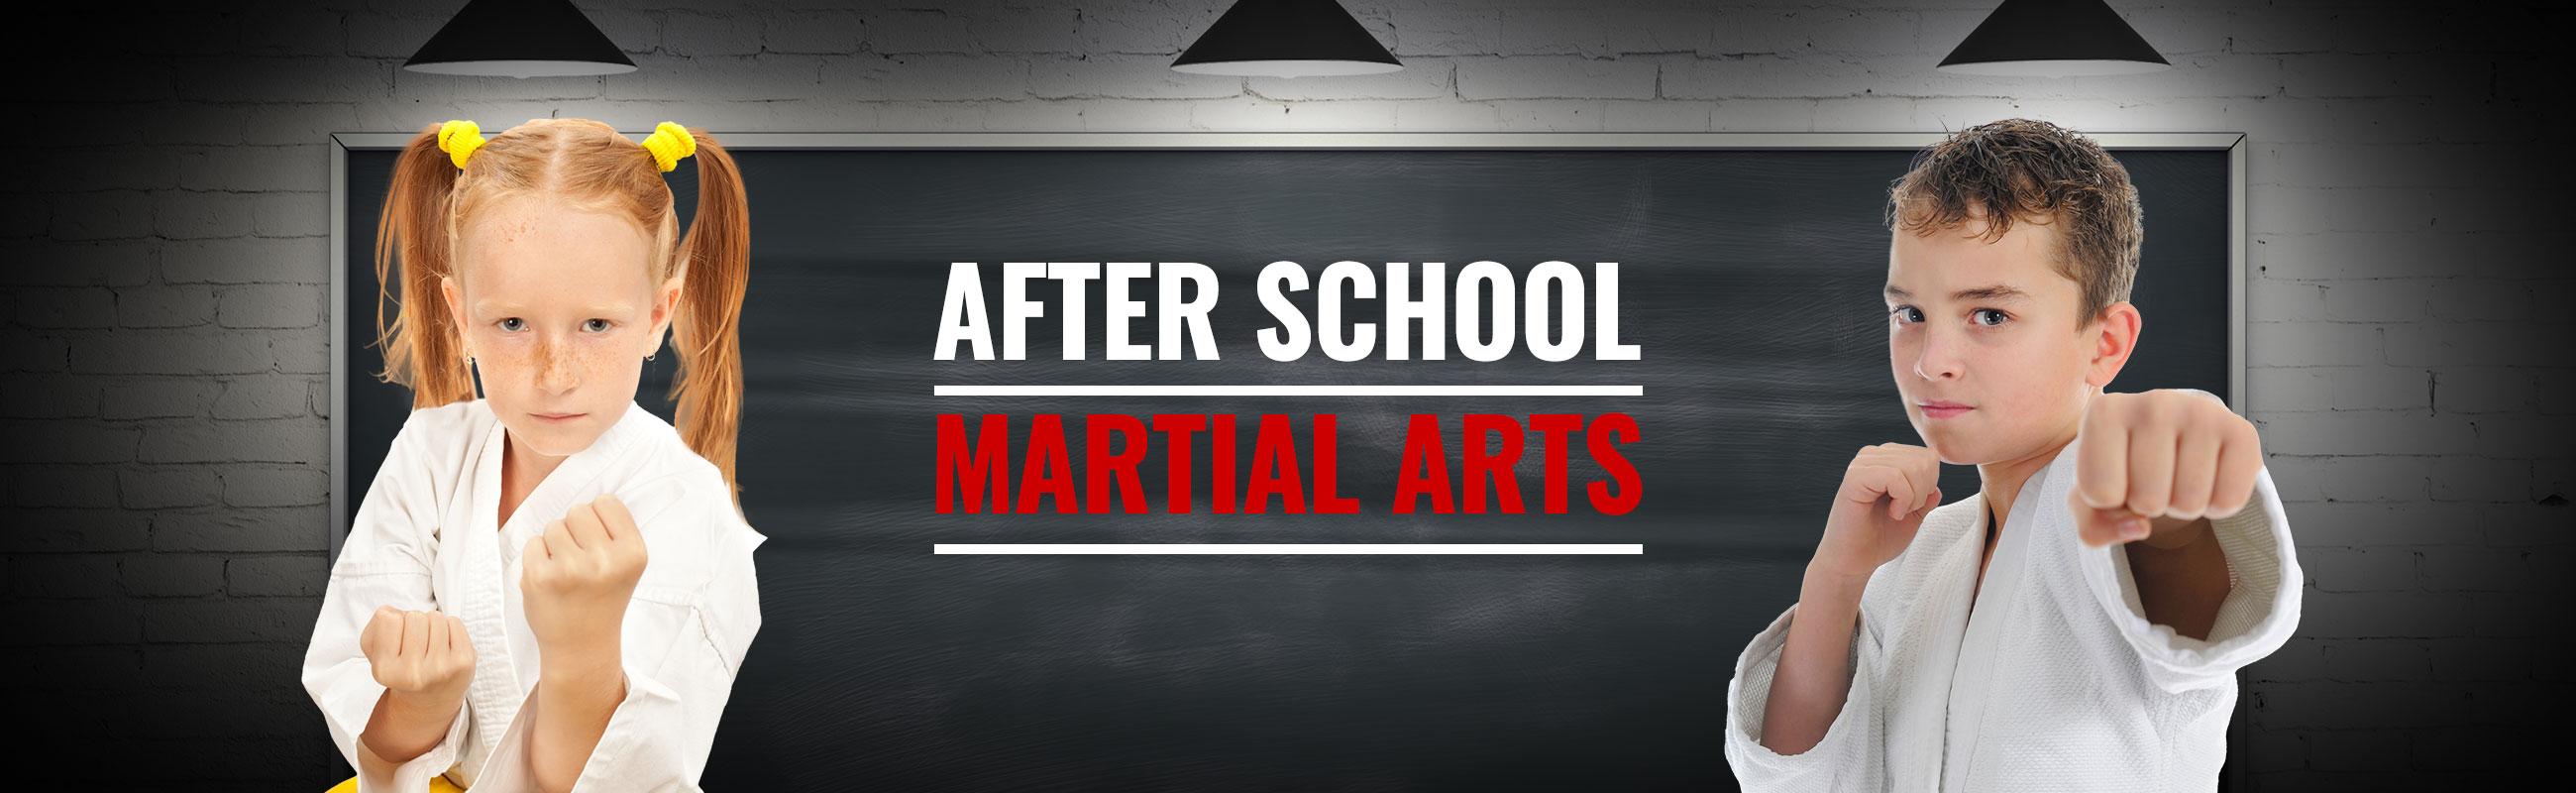 slider-after-school-martial-arts